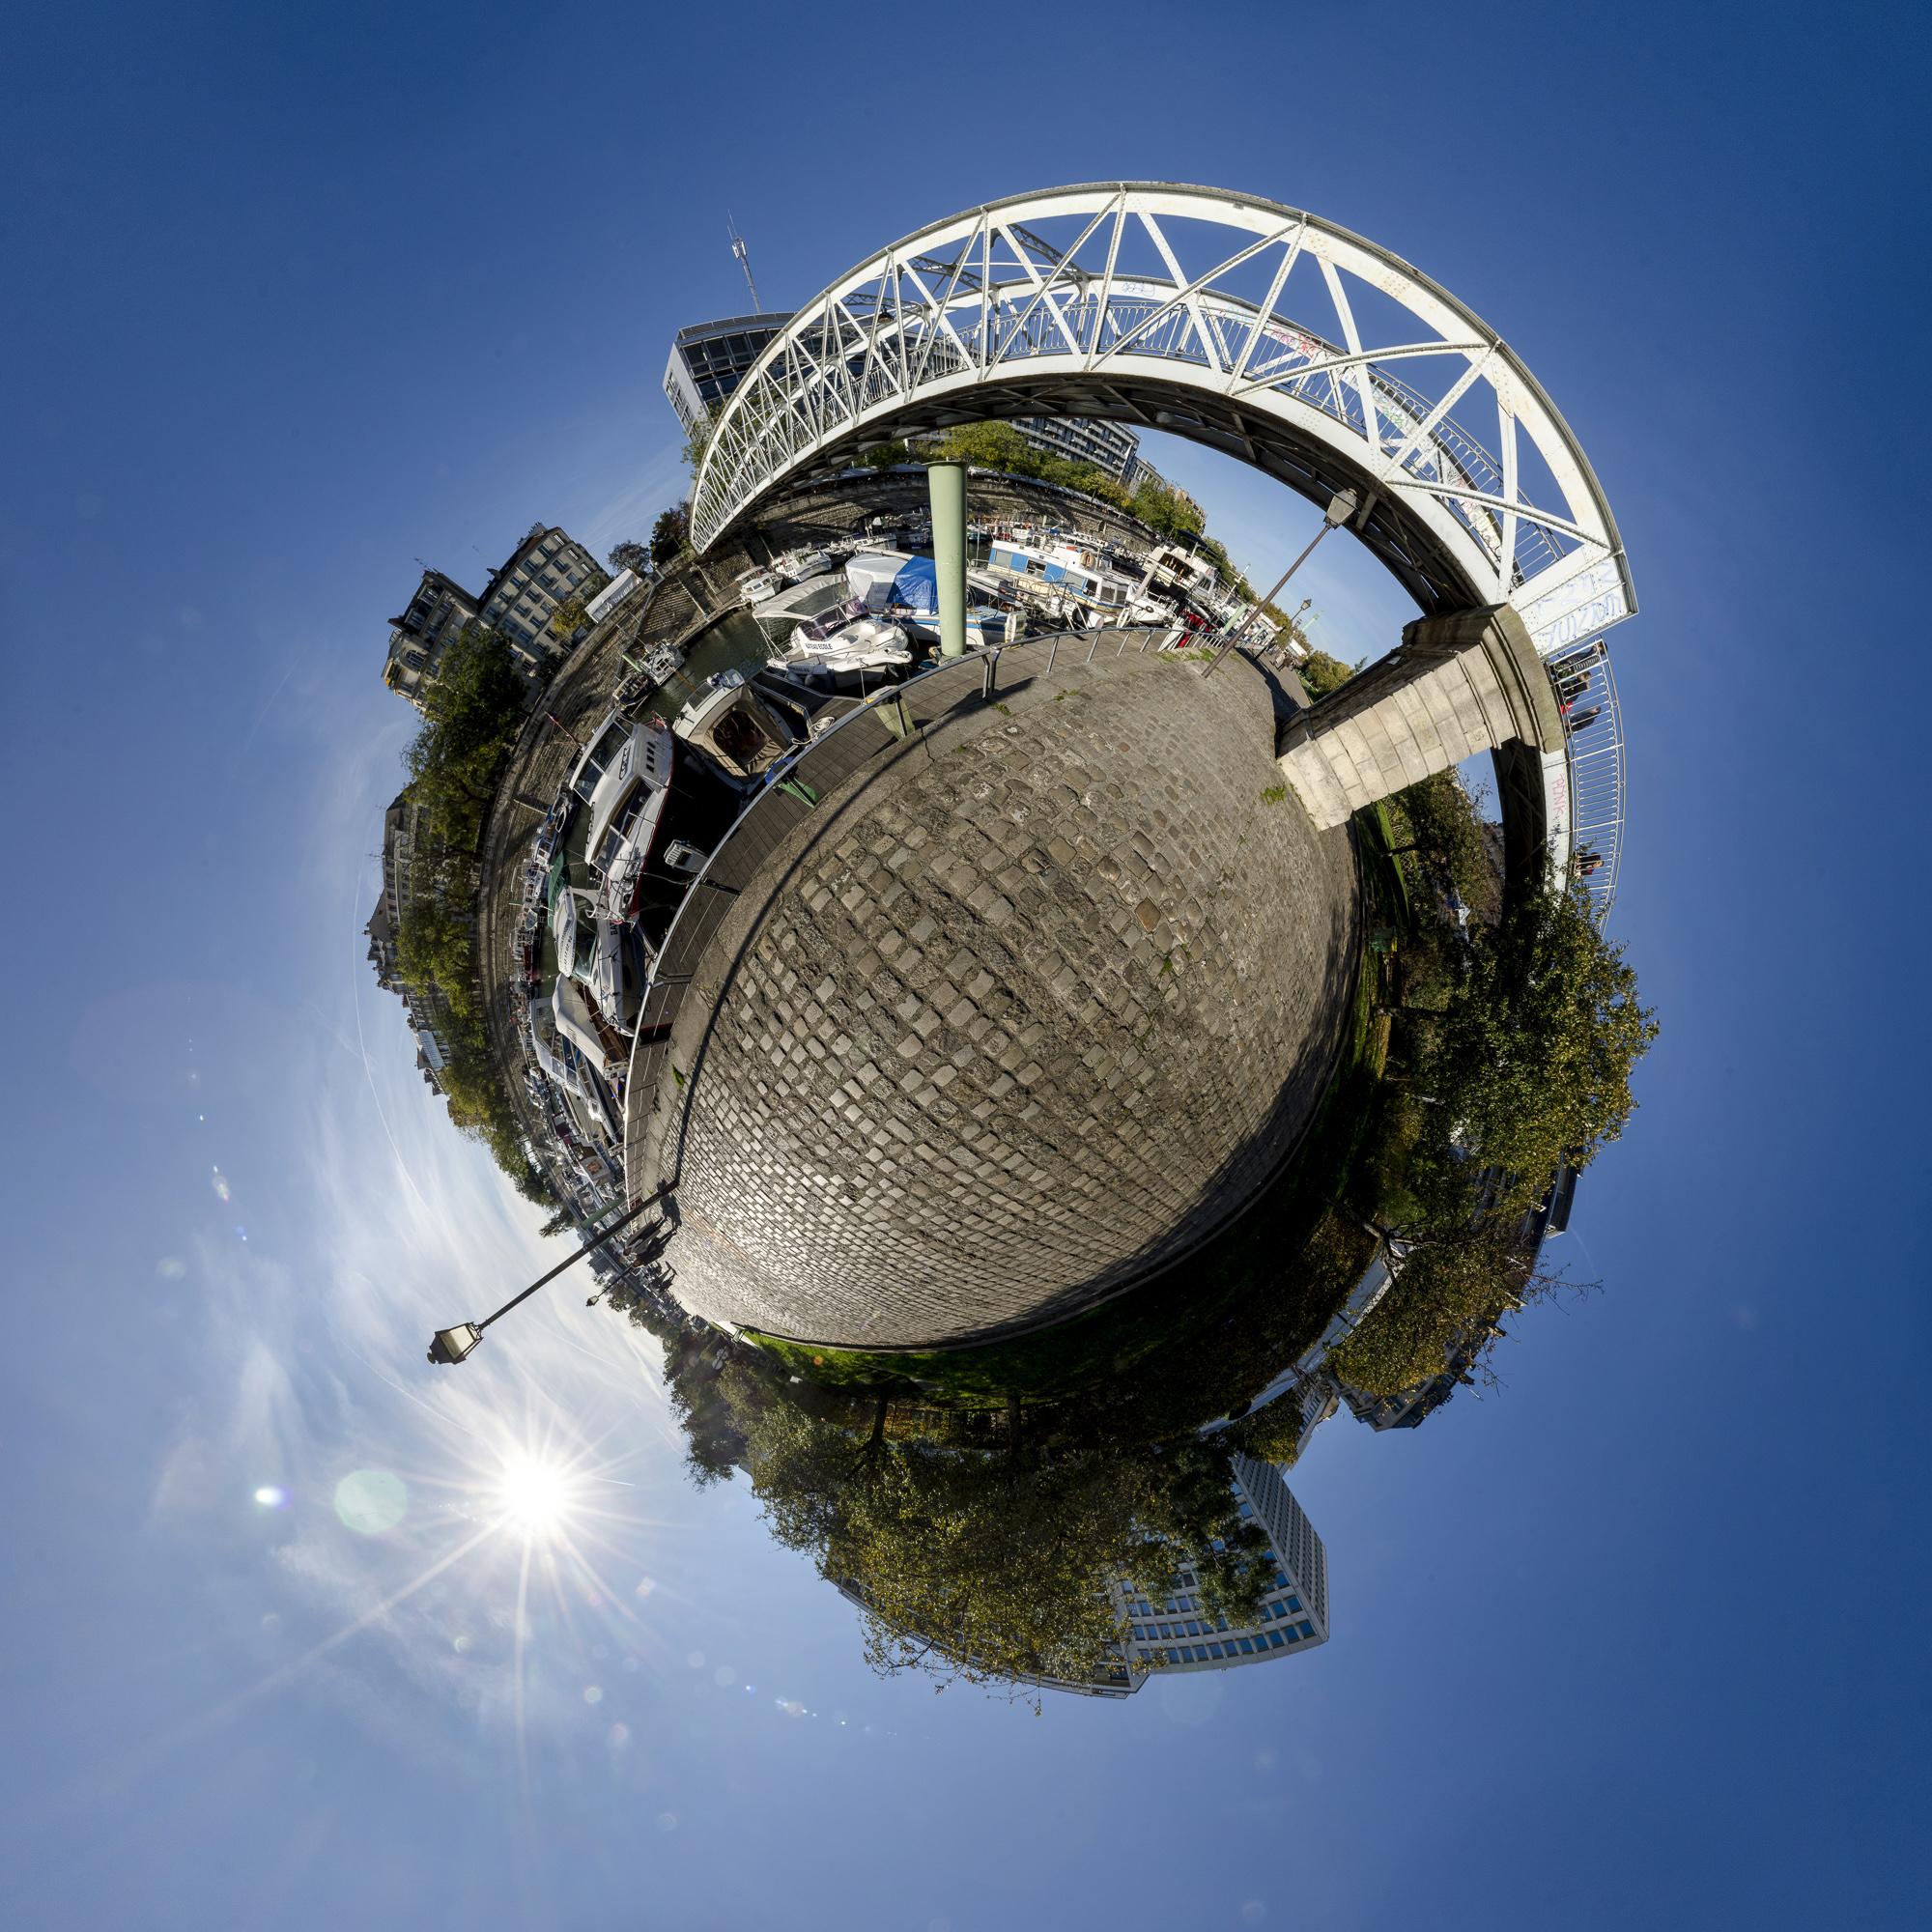 Bassin de l'Arsenal  PHOTOGRAPHY: ALEXANDER J.E. BRADLEY • NIKON D7000